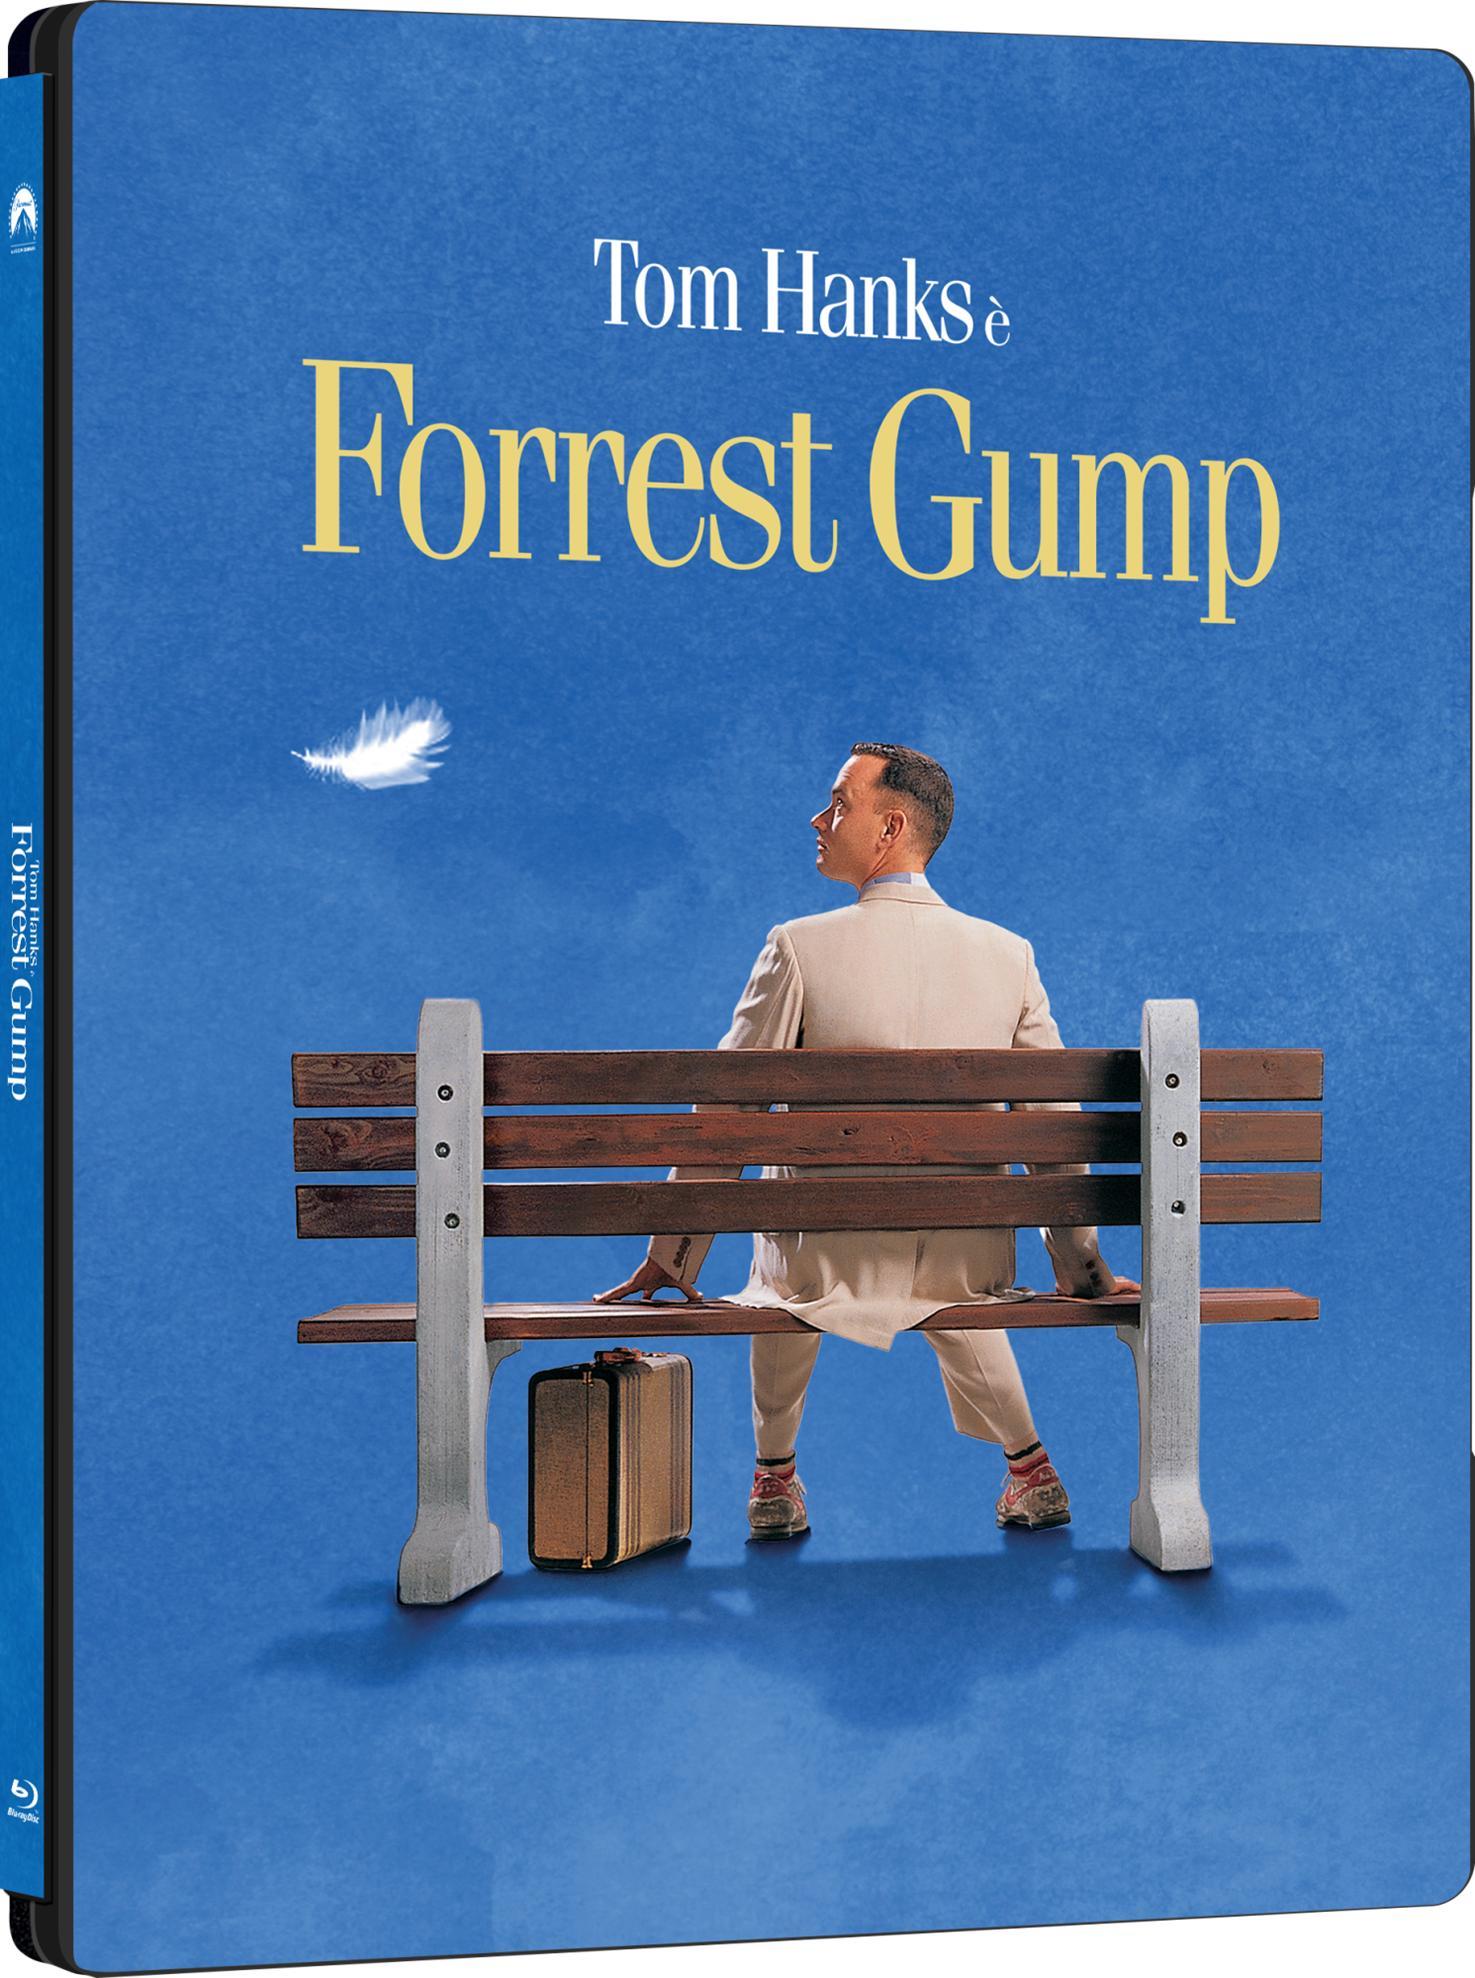 FORREST GUMP (BLU-RAY UHD+2BLU-RAY) (STEELBOOK)